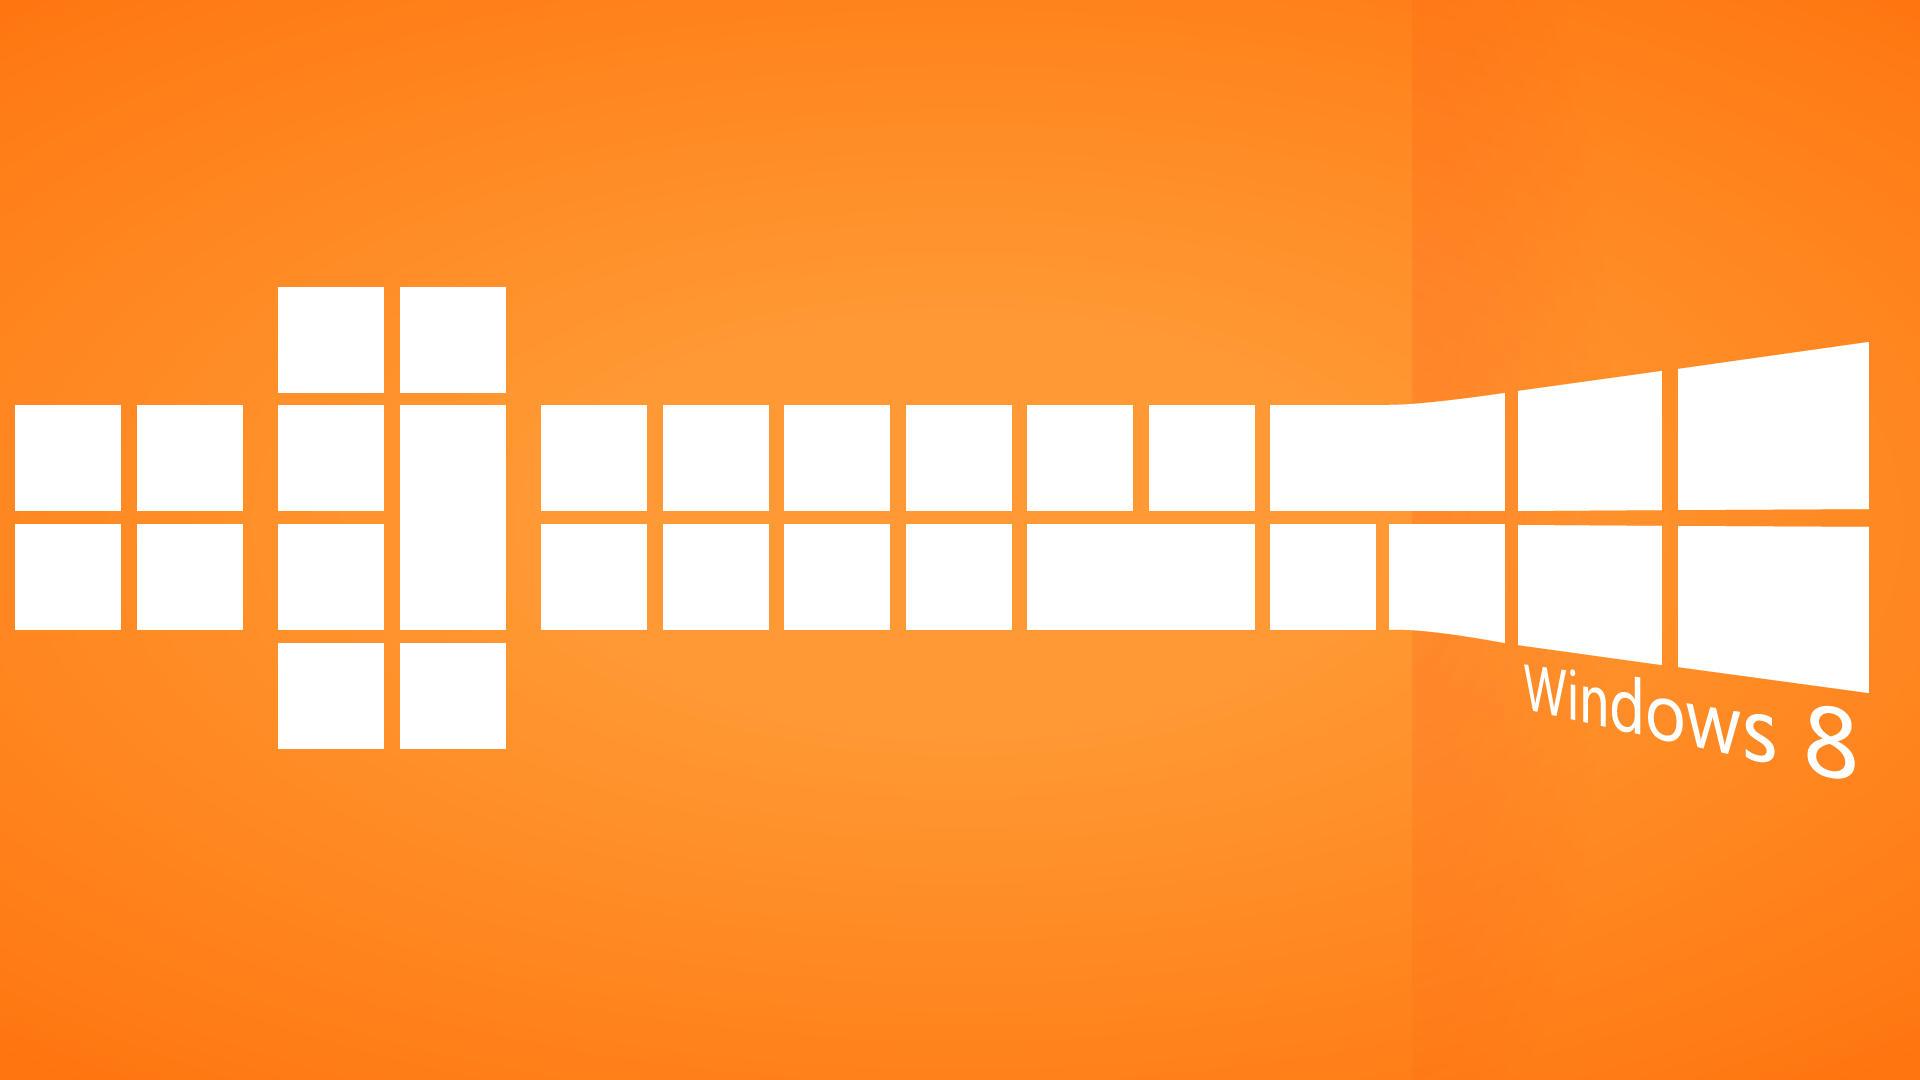 Windows 8 Wallpaper by PureSlurpee